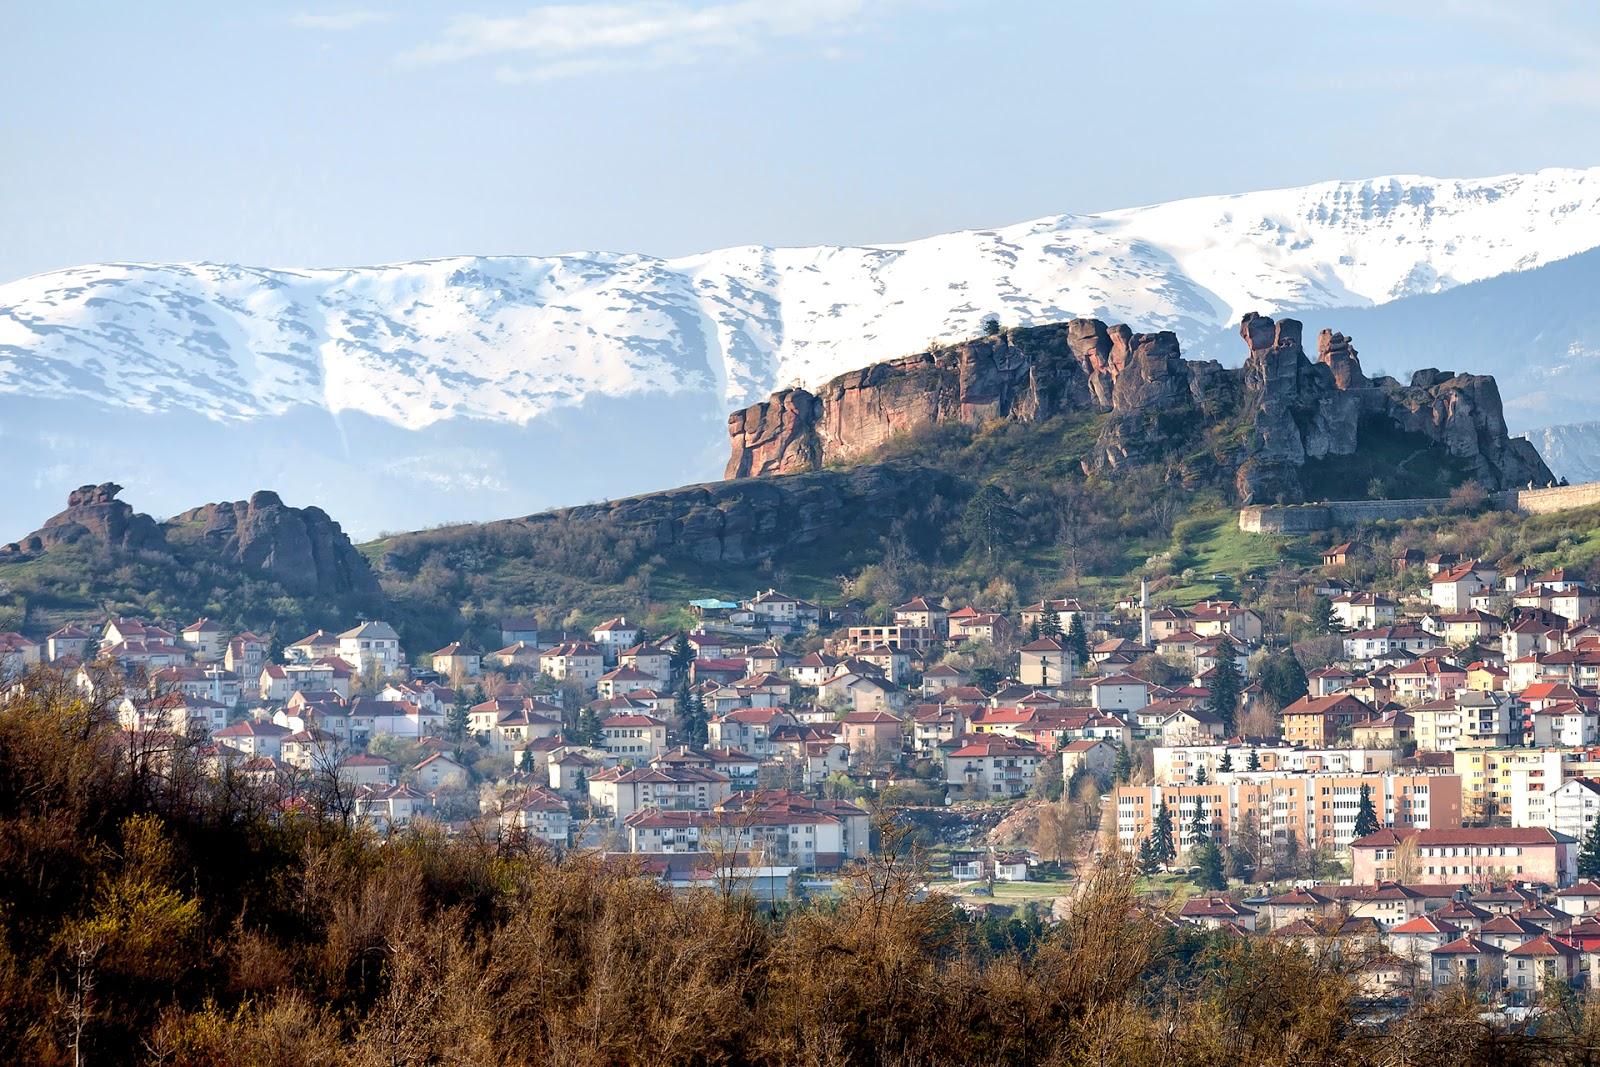 Bułgaria - Belogradchik